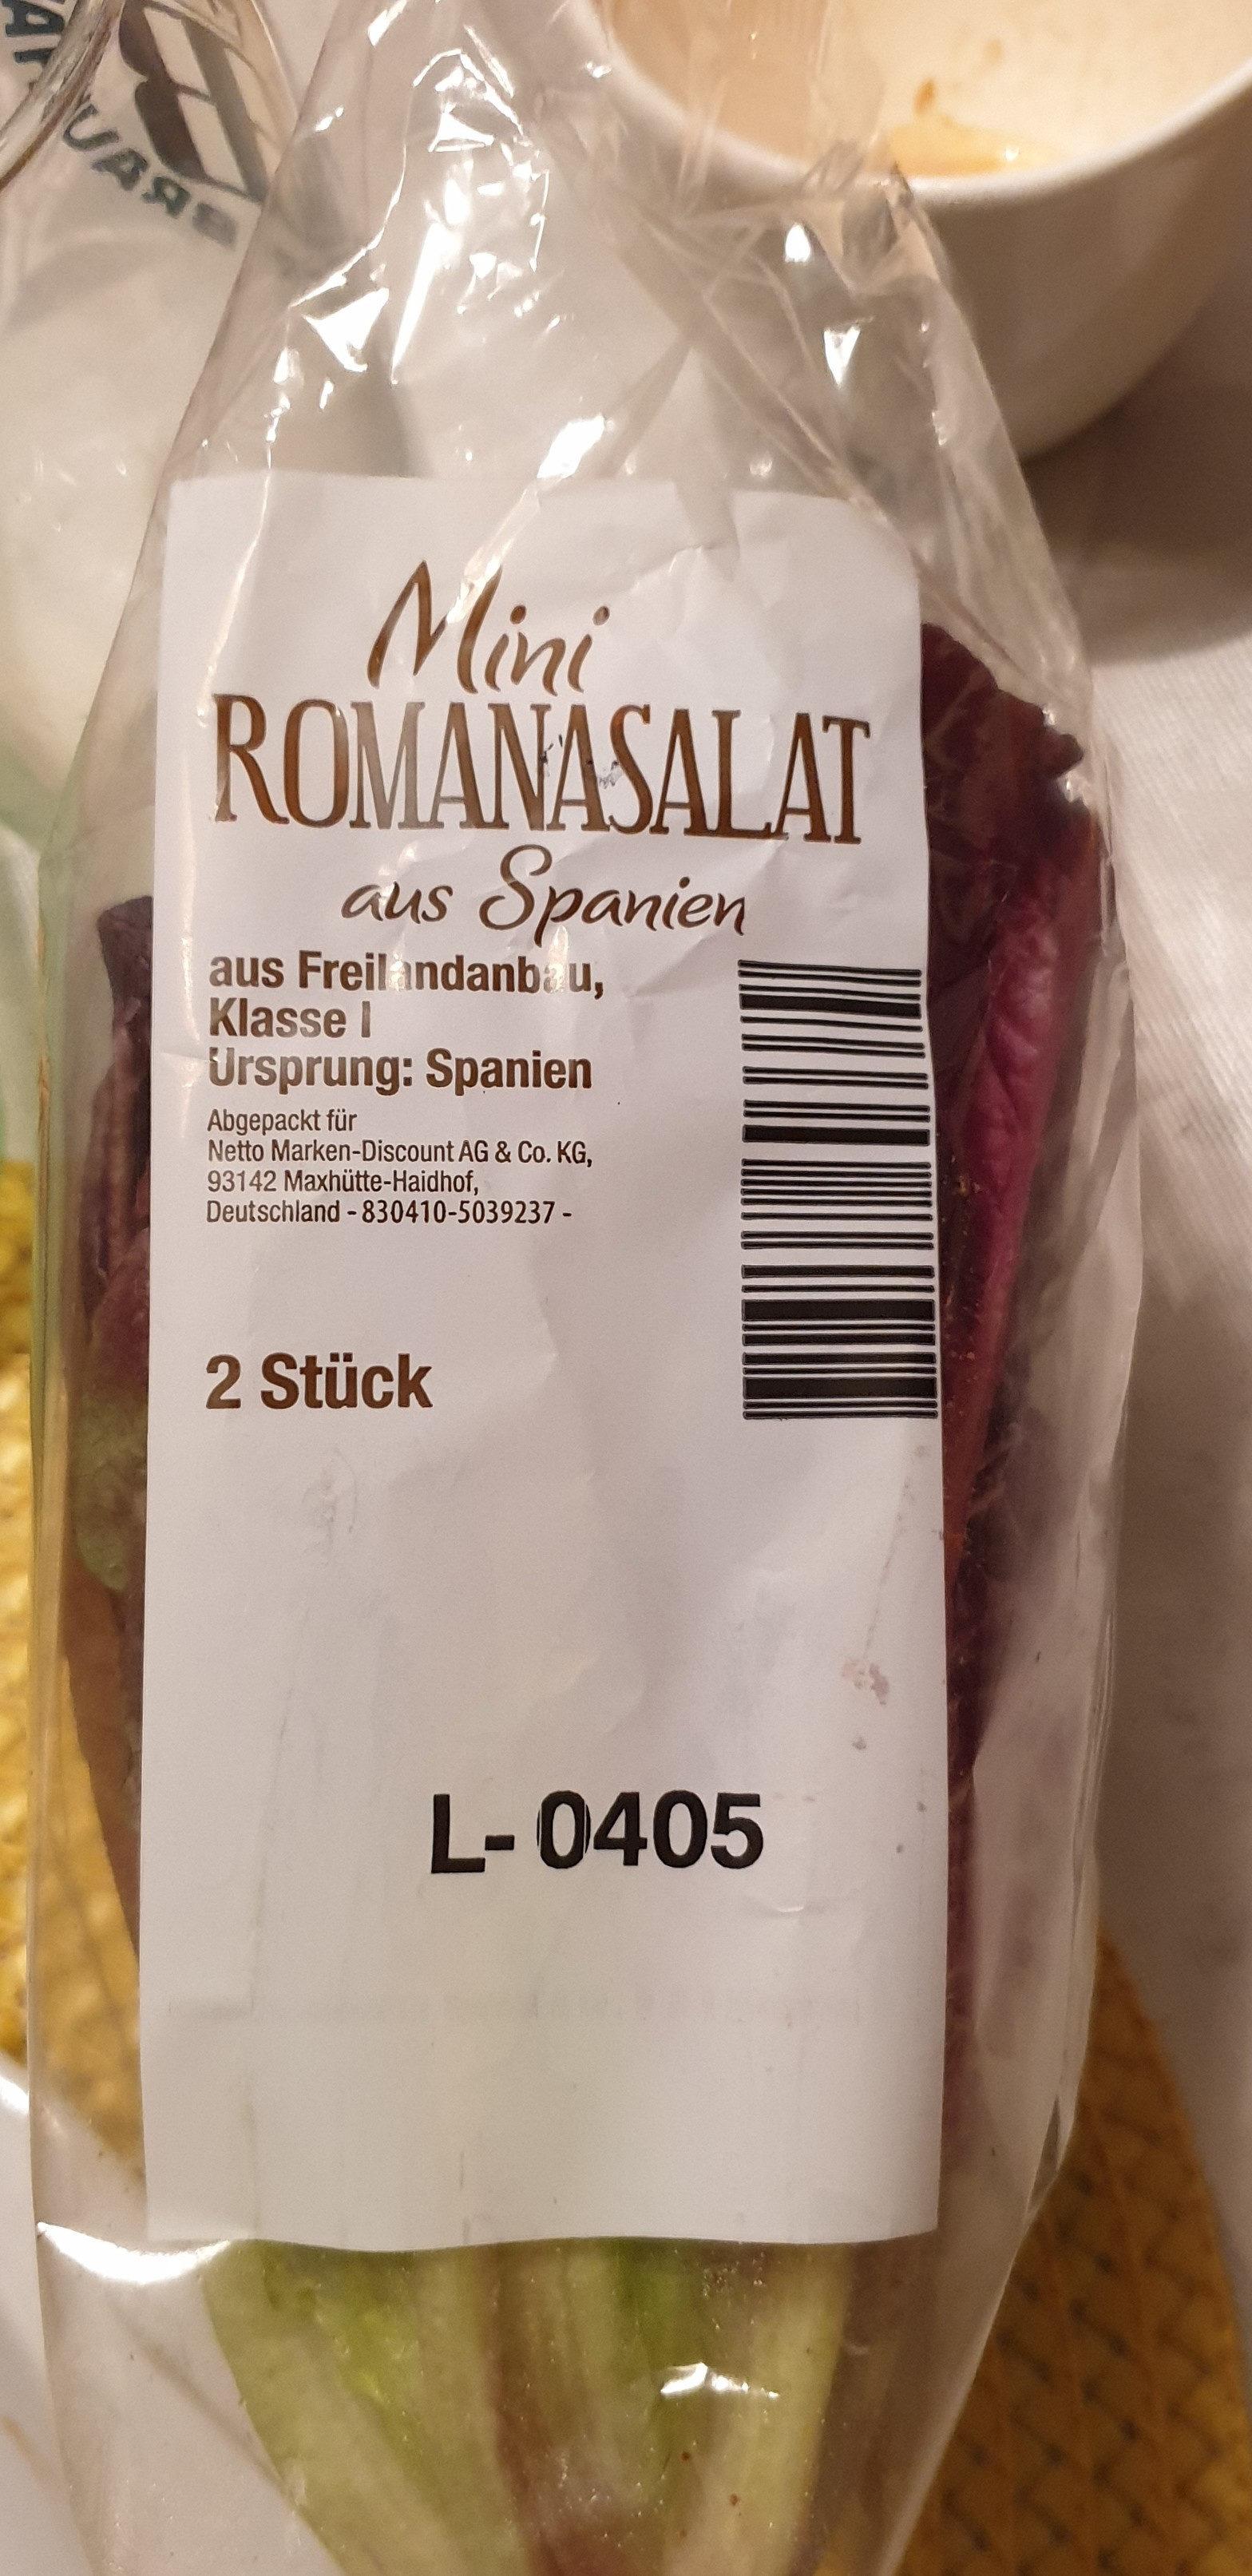 Mini Romanasalat - Ingrédients - de